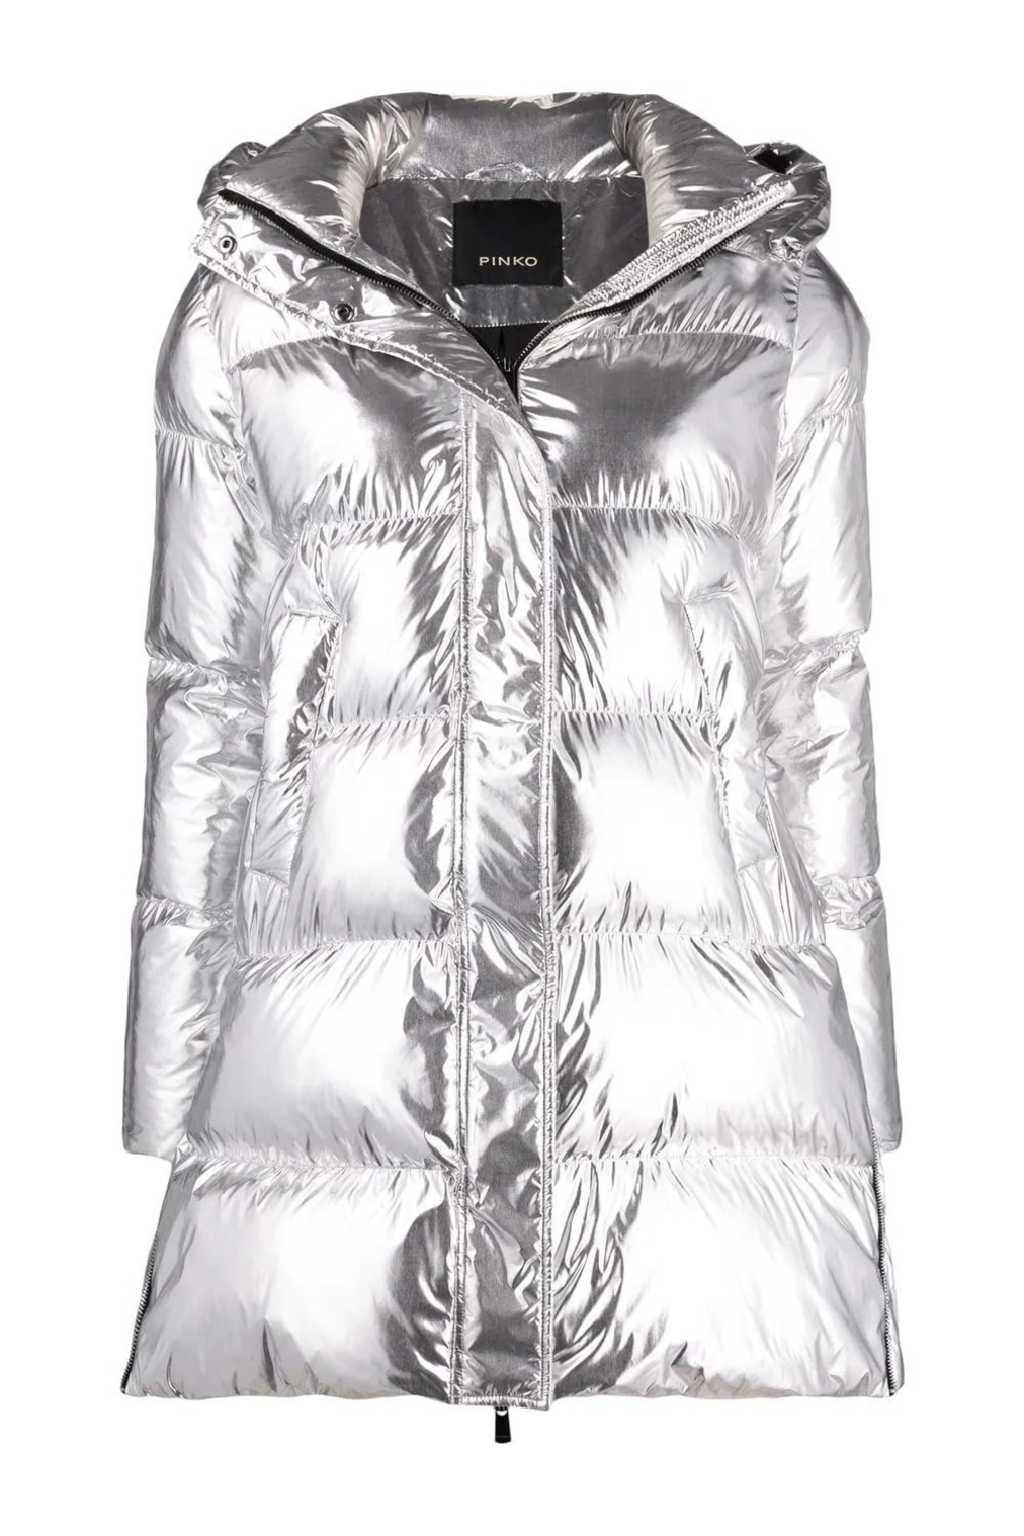 Dámská bunda Pinko Illica stříbrná